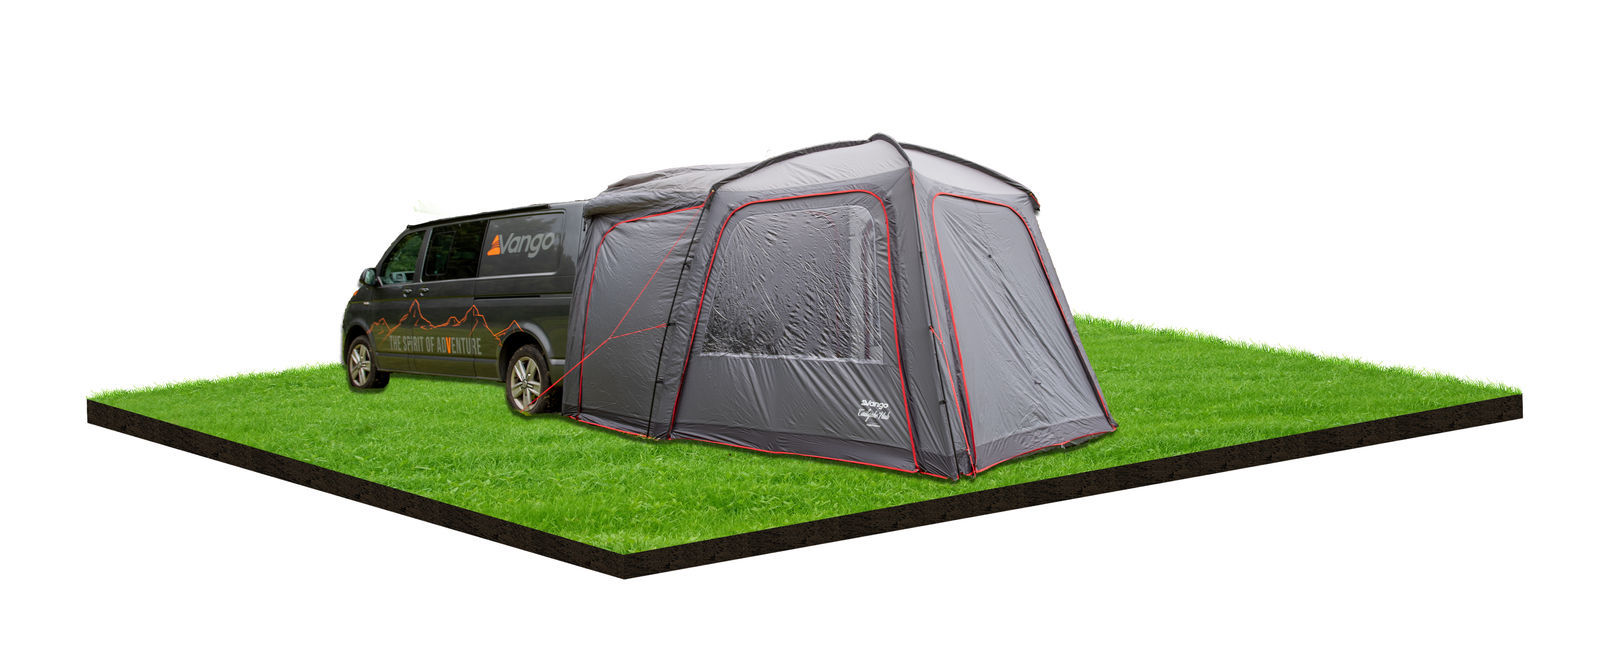 Vango Tailgate Hub Low 2021 Norwich Camping 9